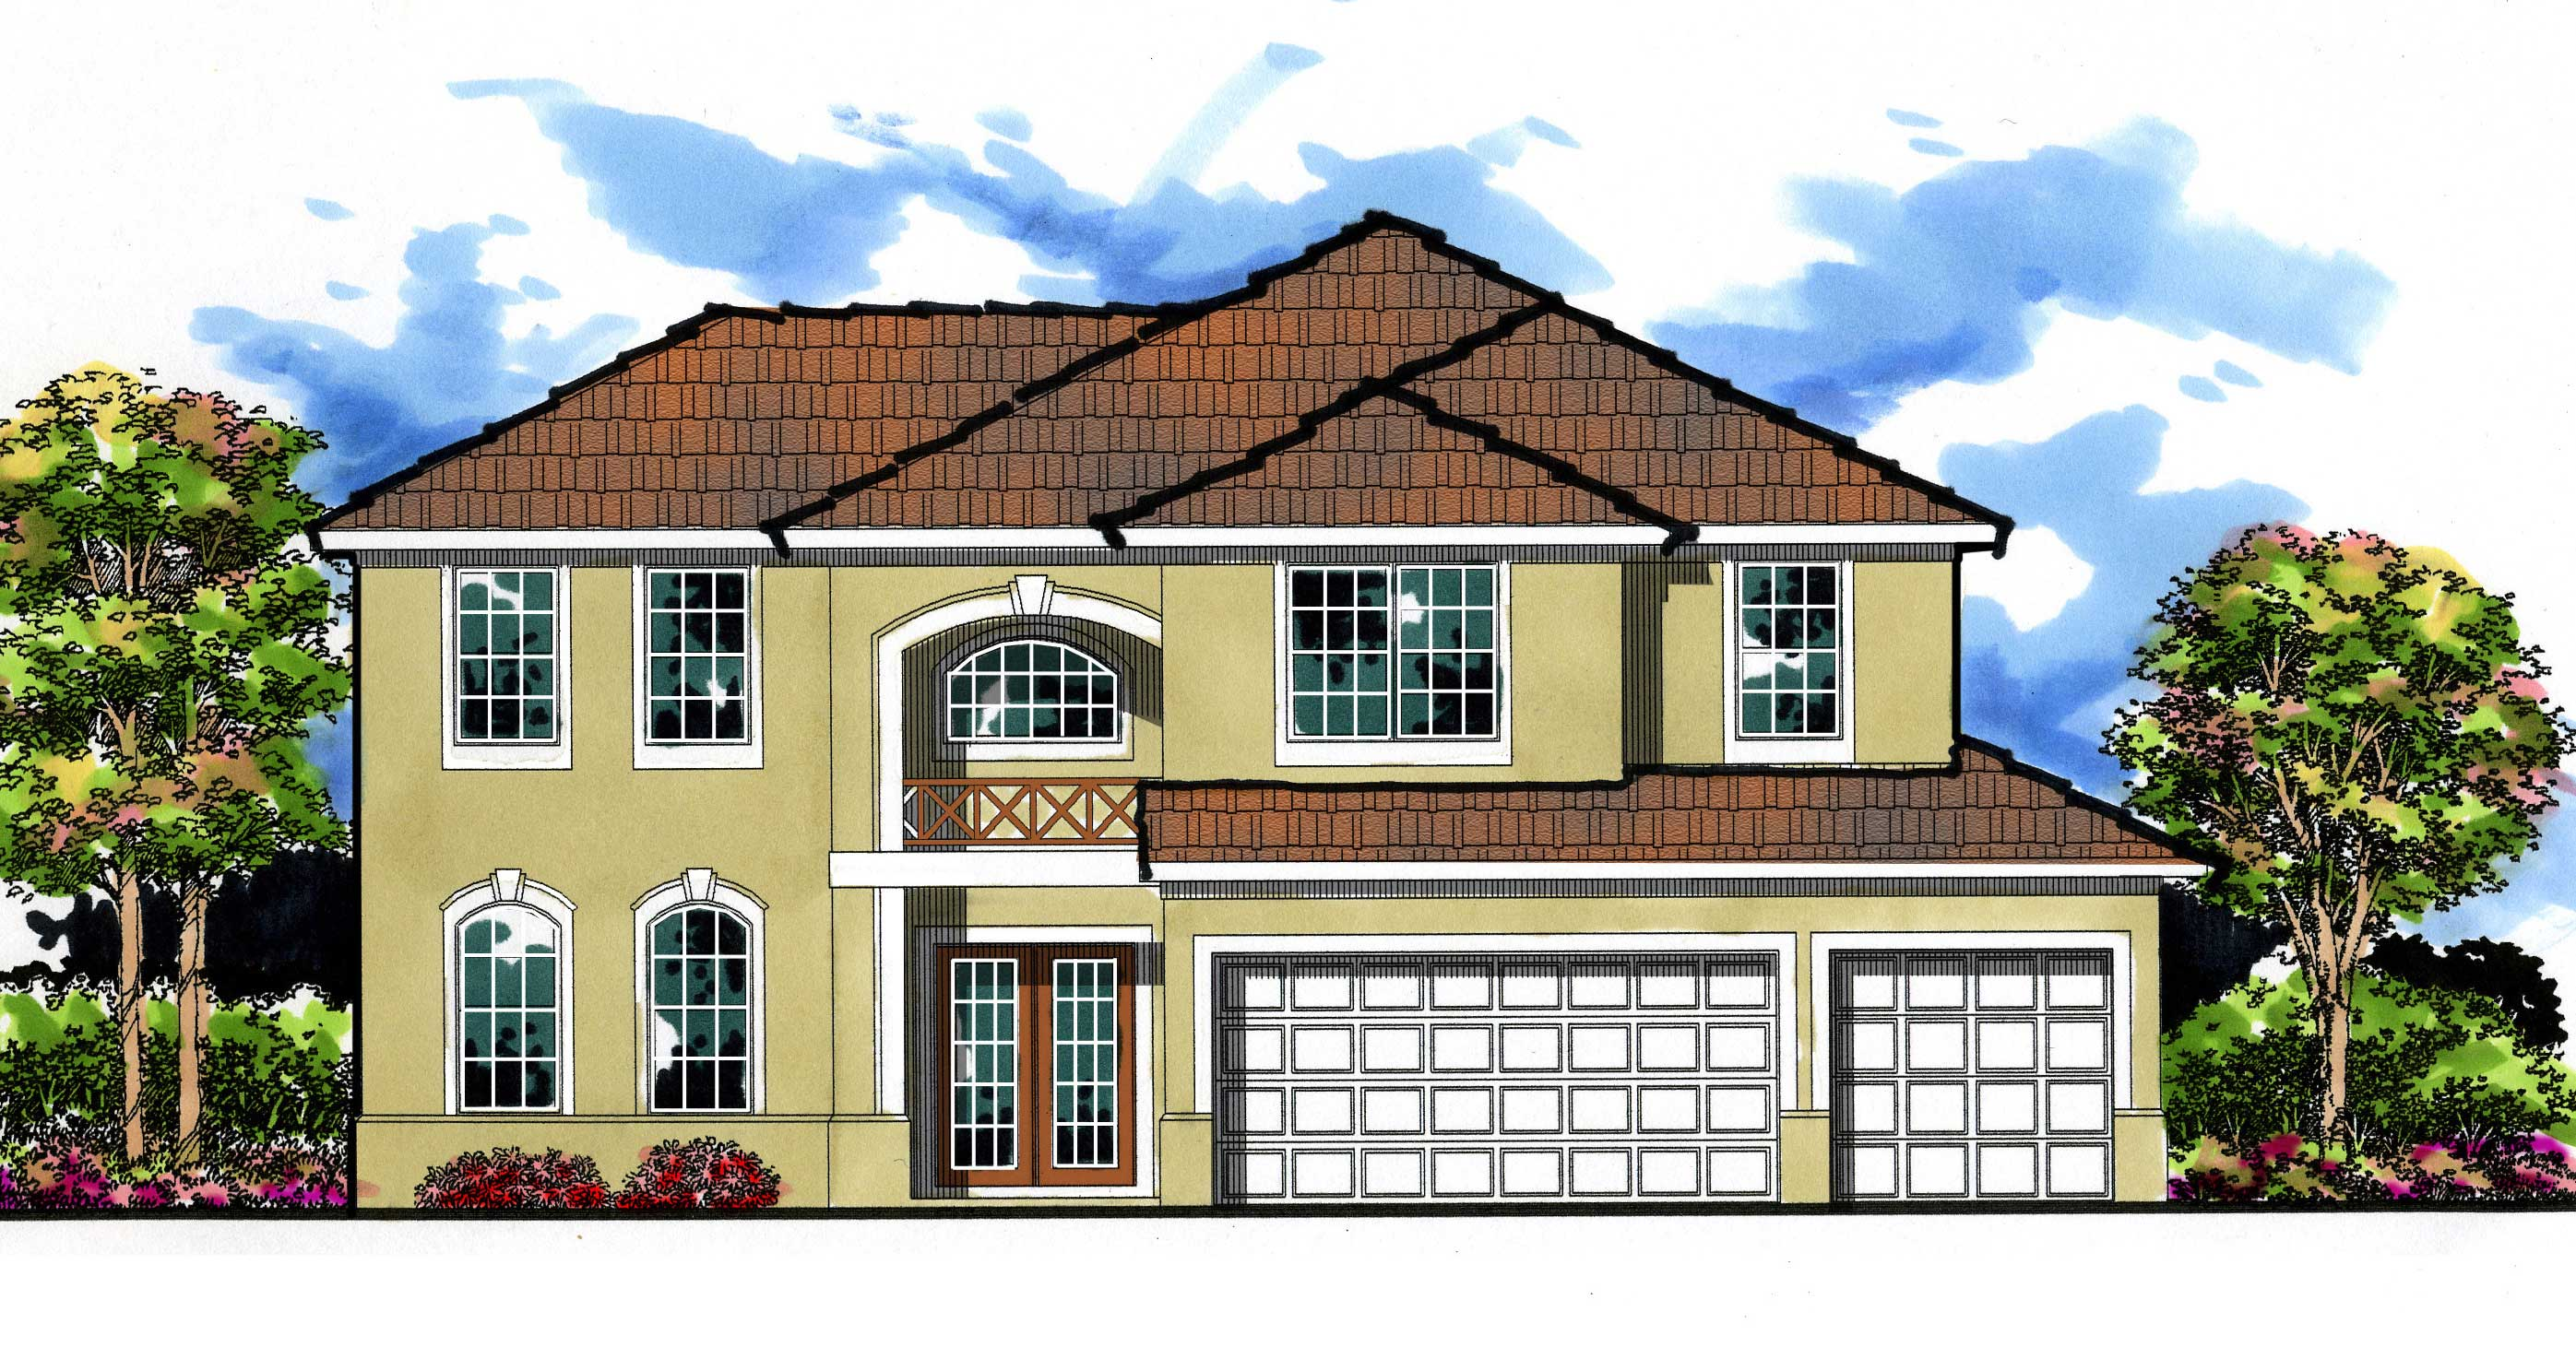 Mediterranean House Plans Home Design 2817